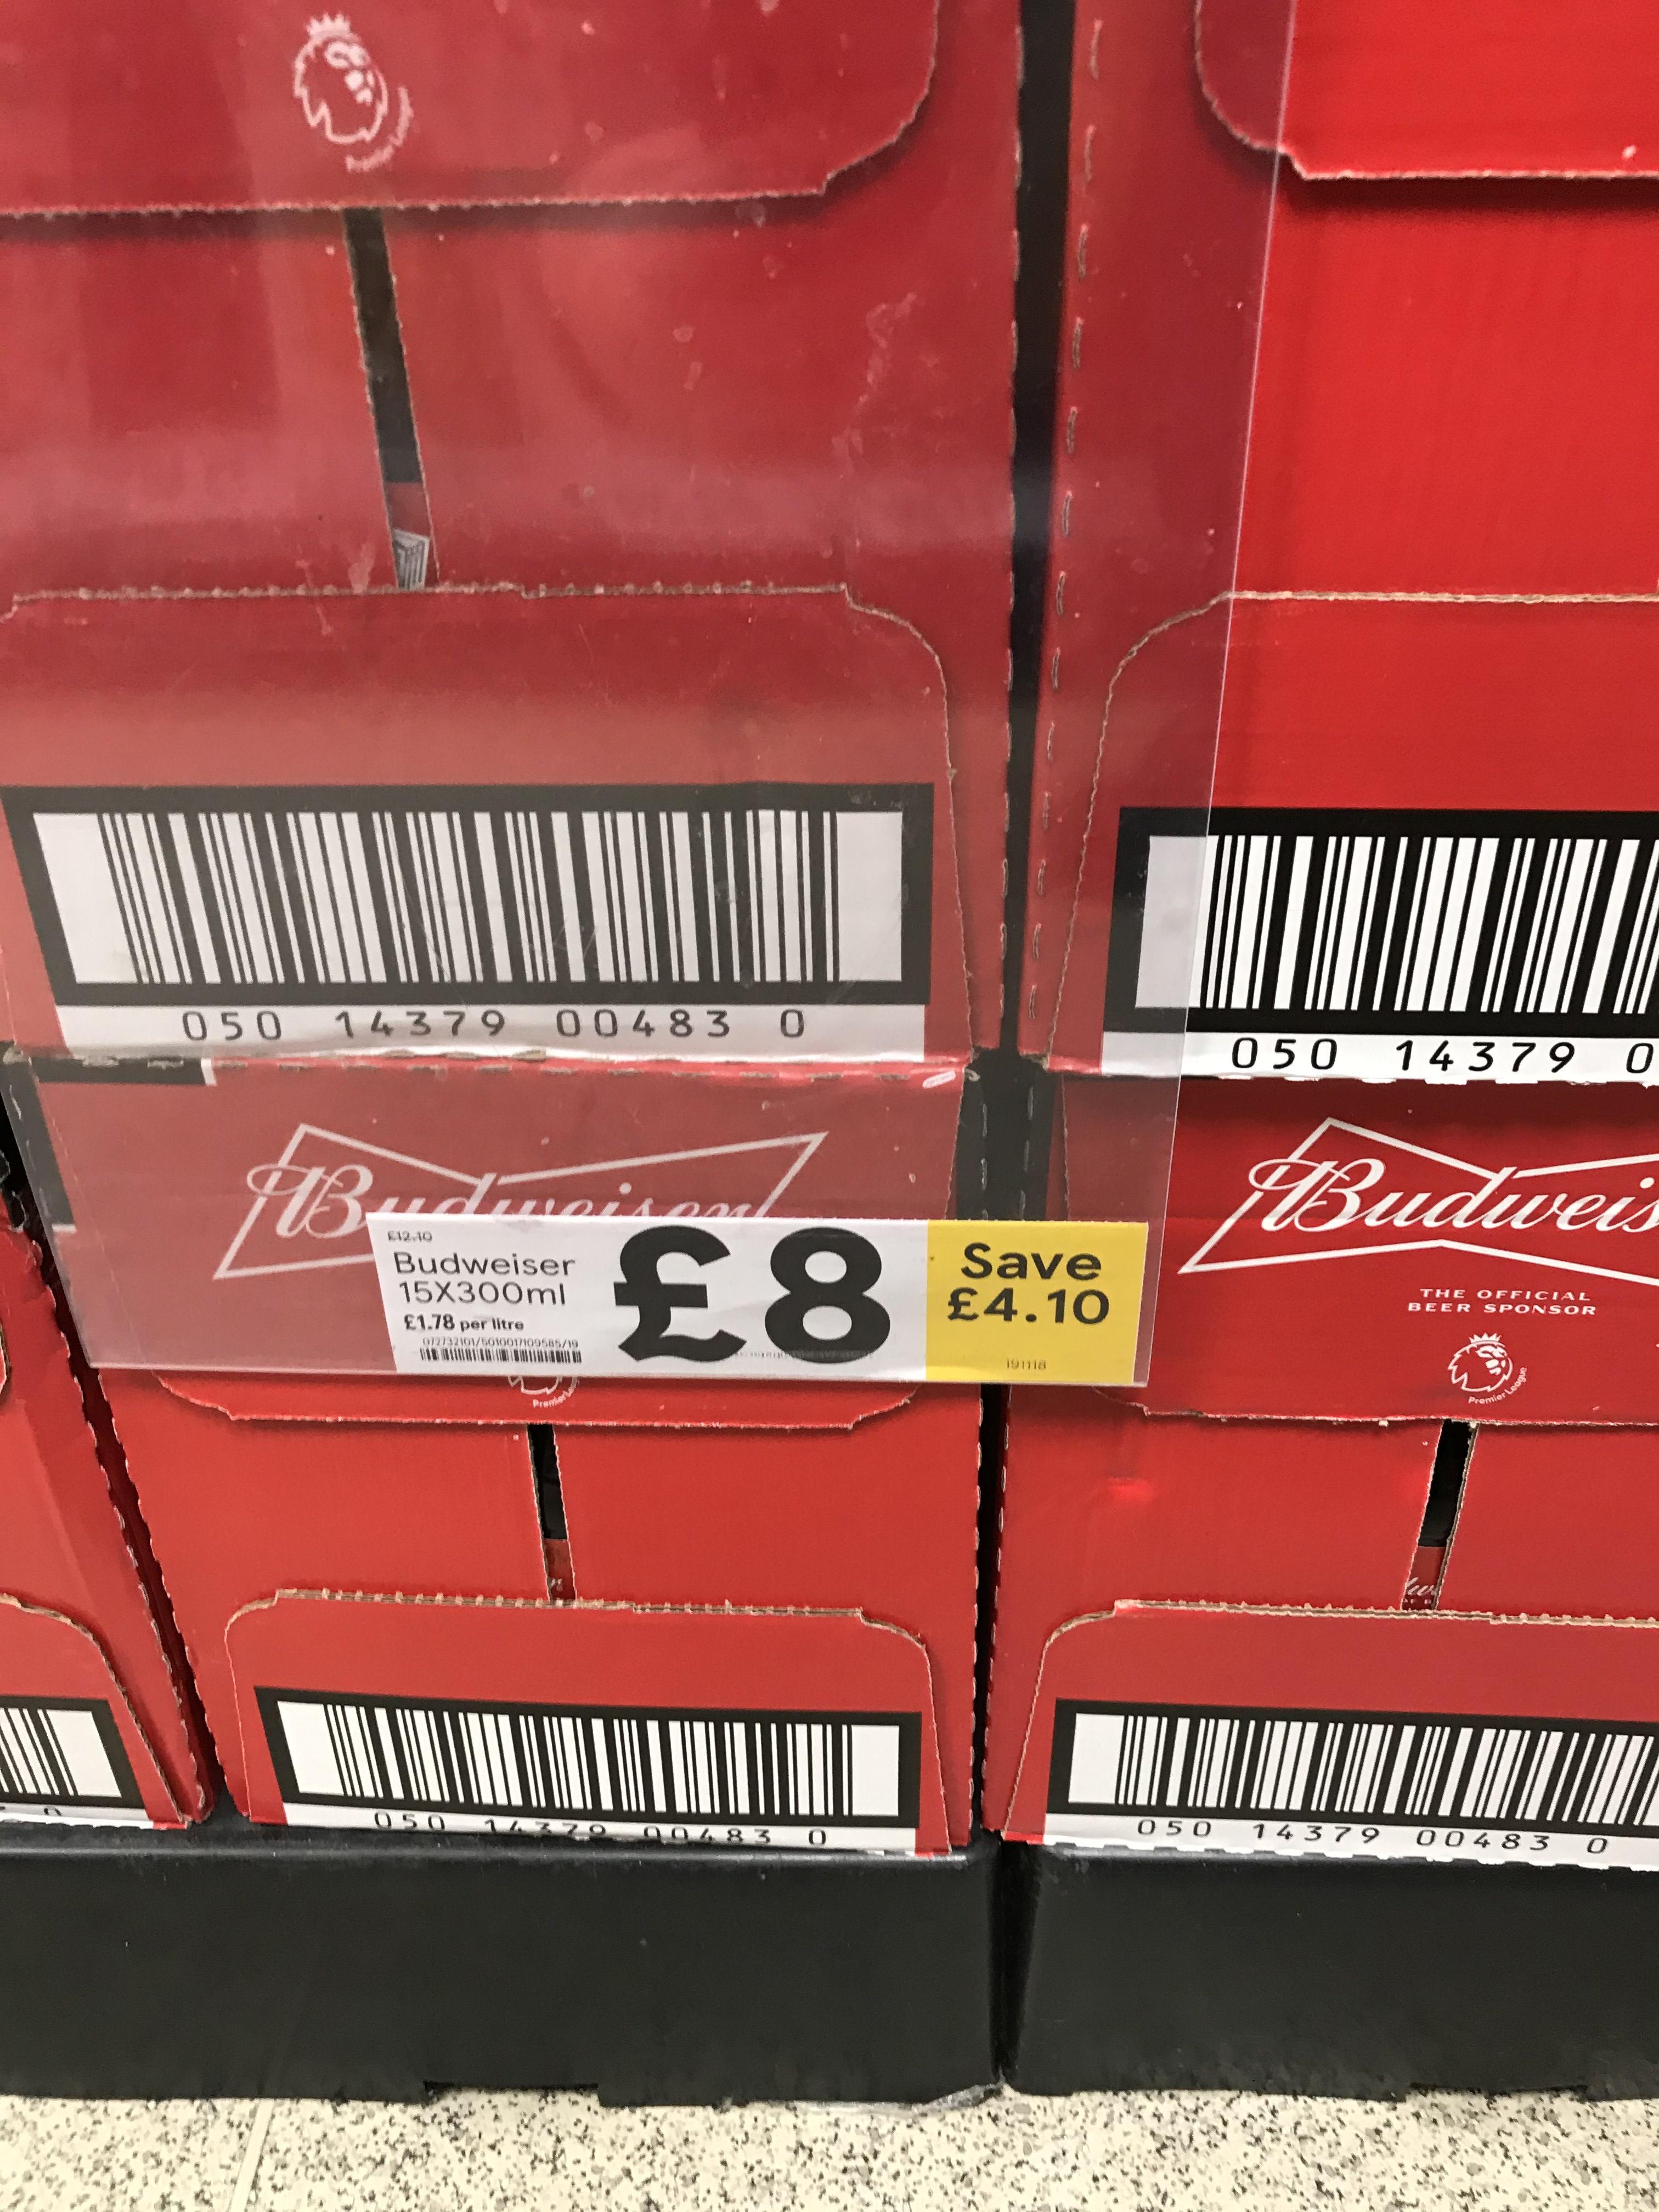 15 Budweiser £8 @ Tesco instore